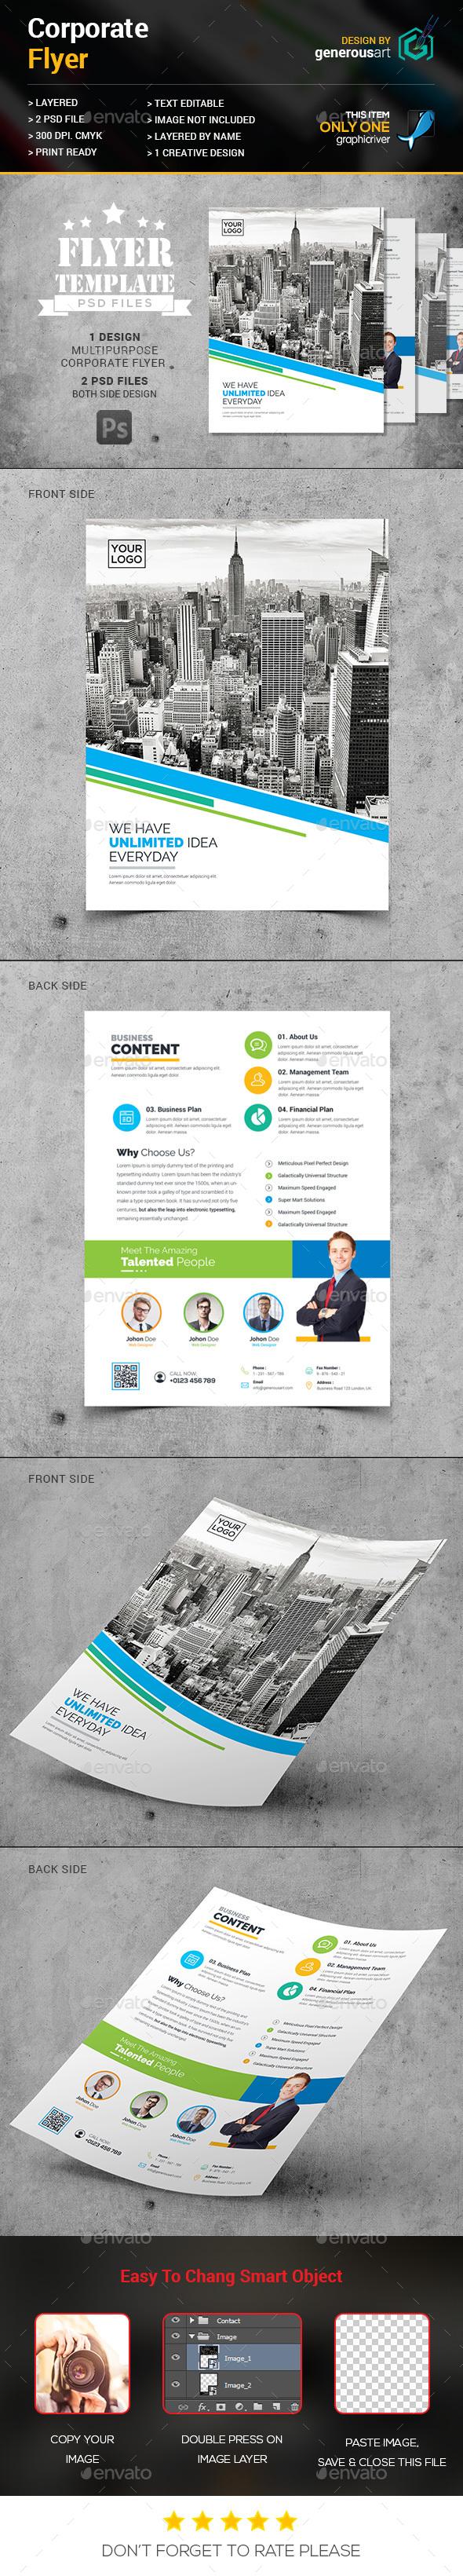 New Creative Flyer - Corporate Flyers